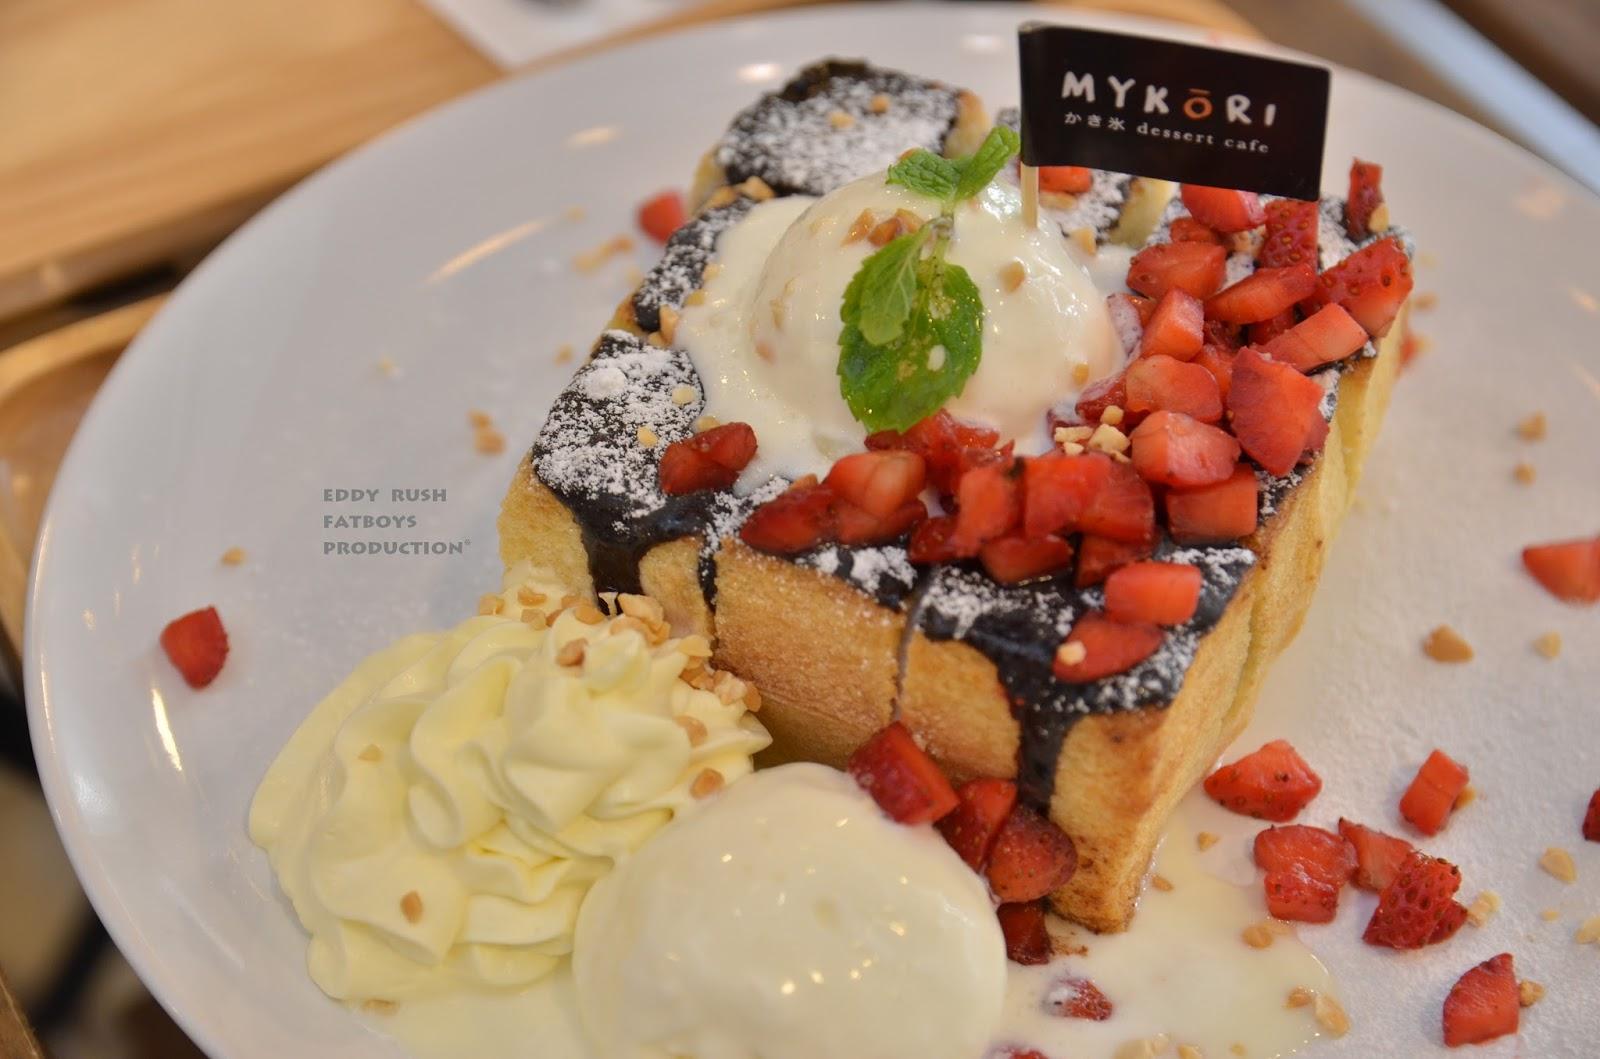 Mykōri Dessert Cafe Bandar Puchong Jaya